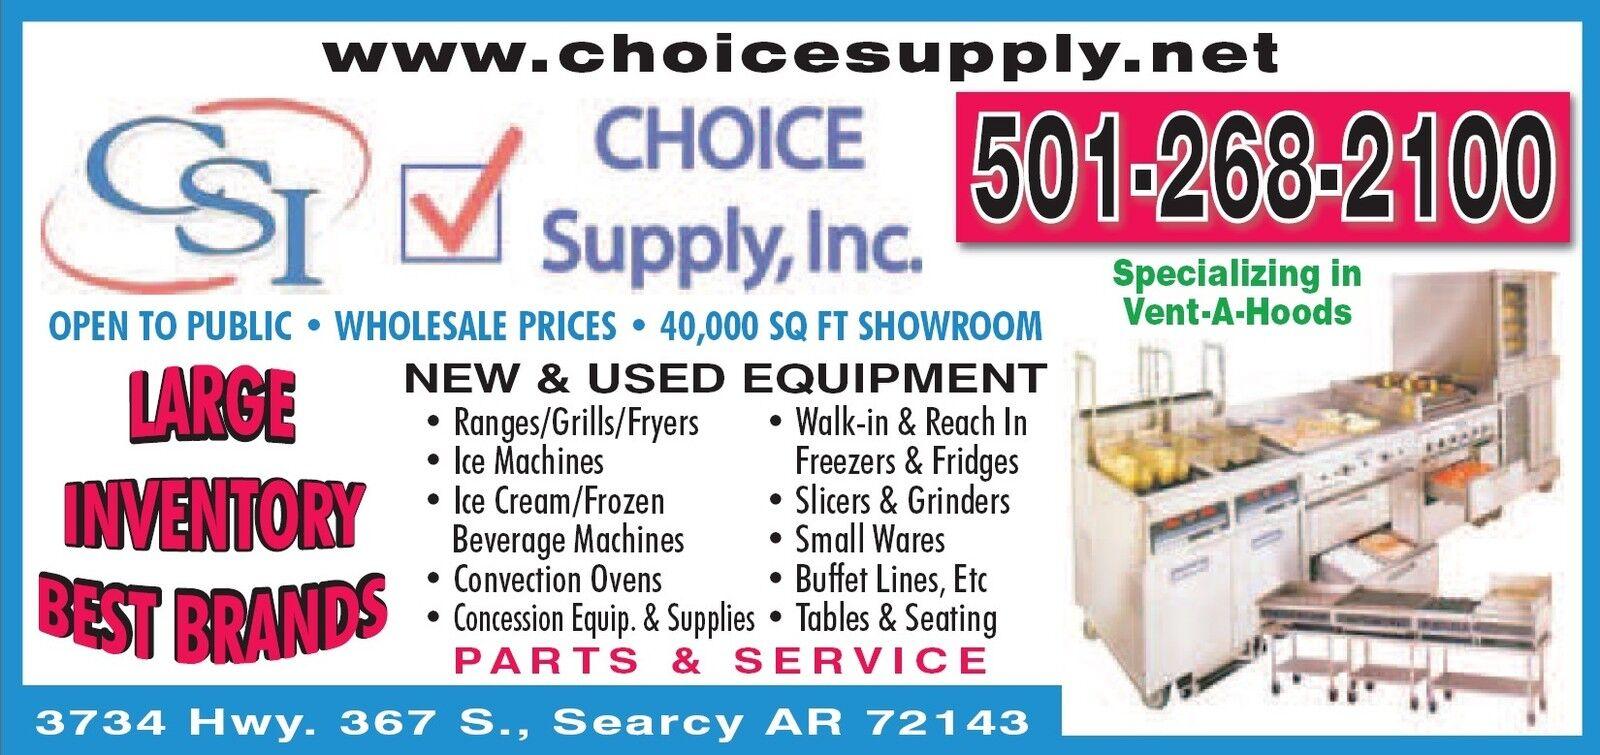 Choice Supply Inc